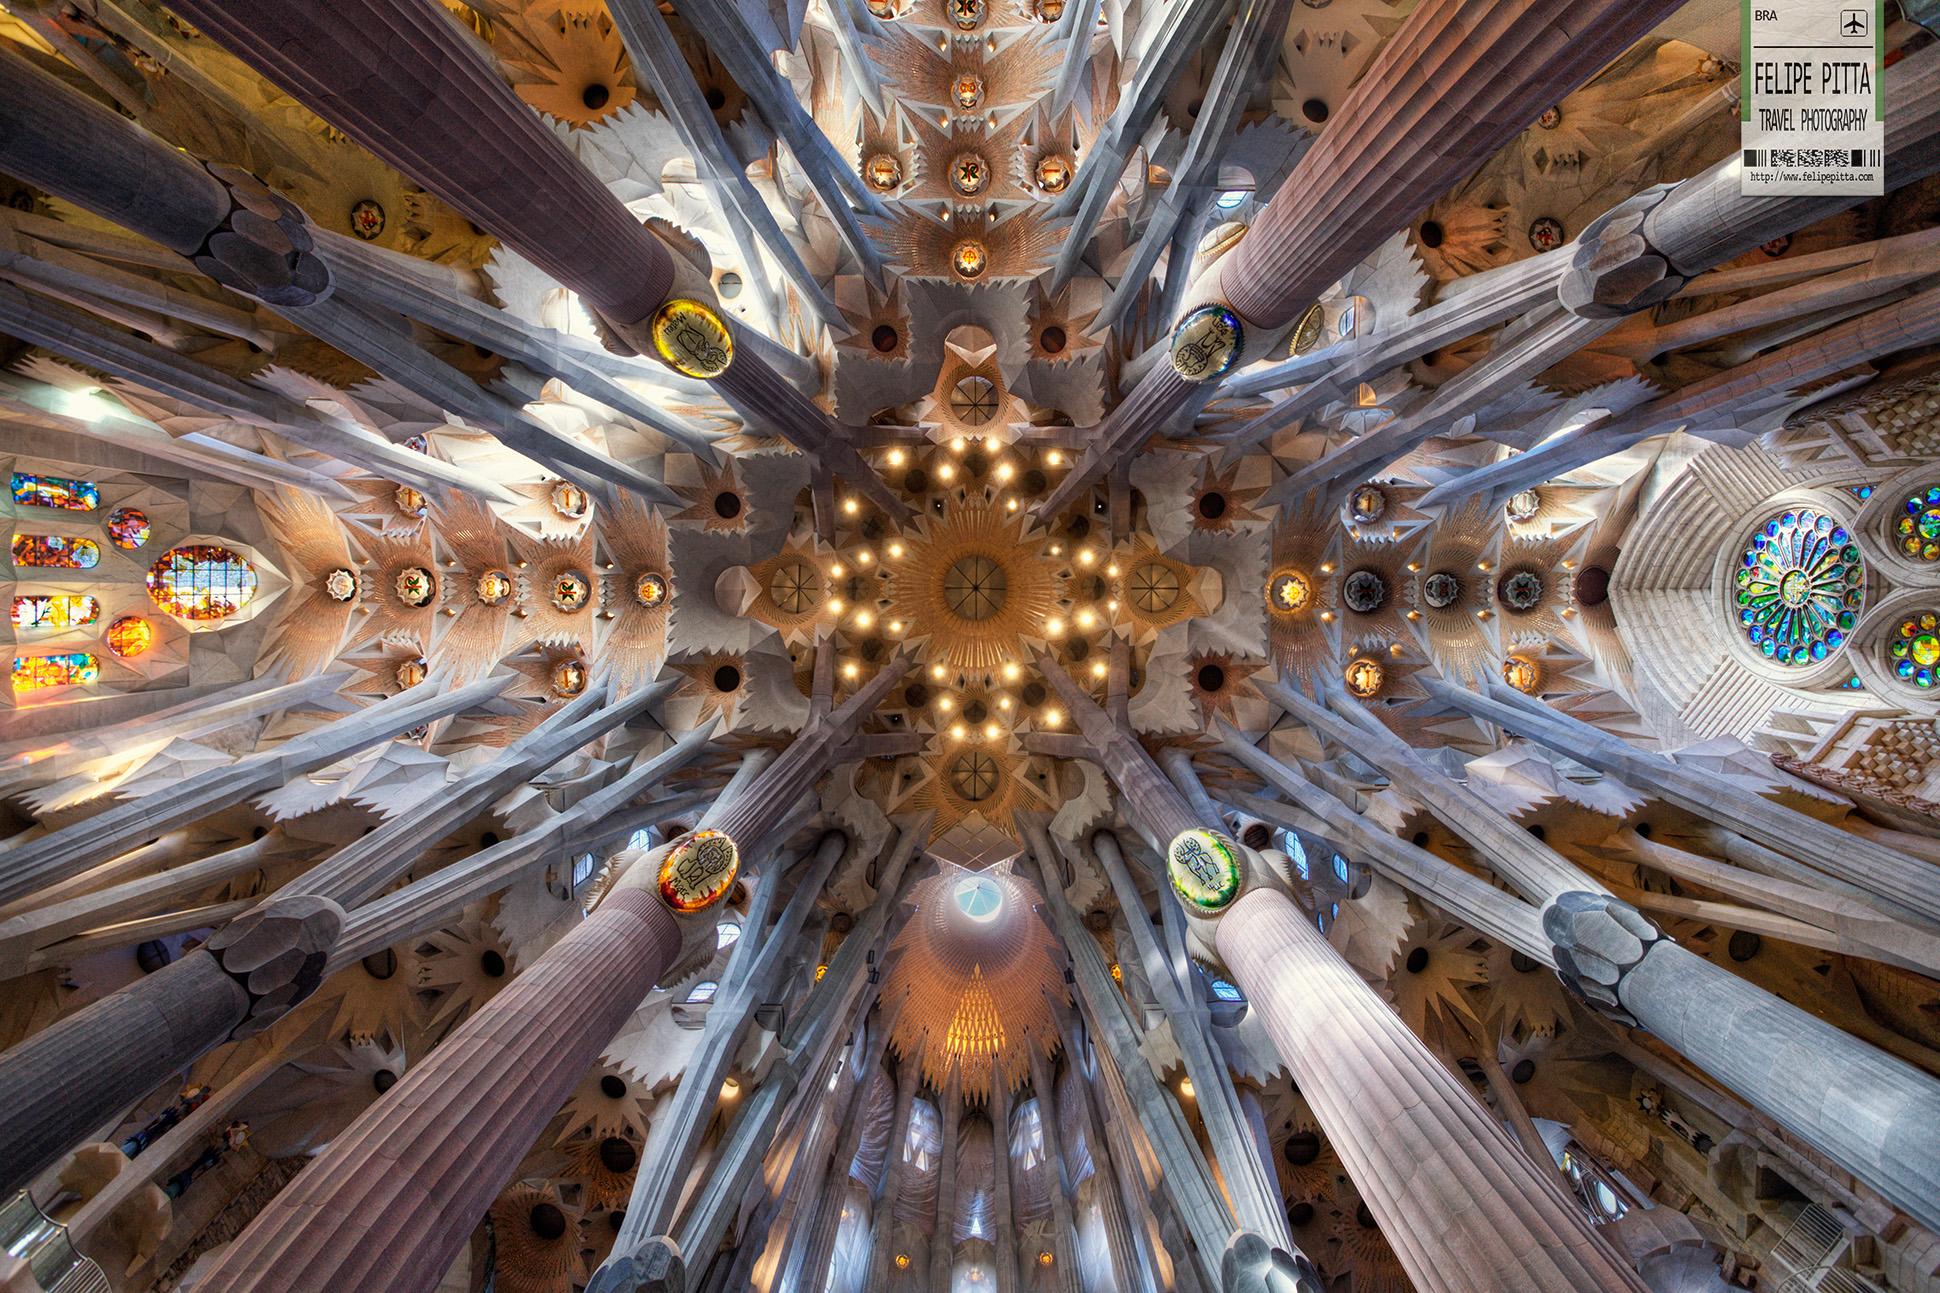 Sagrada Familia Barcelona Catalunya Antoni Gaudi Interior Roof Felipe Pitta